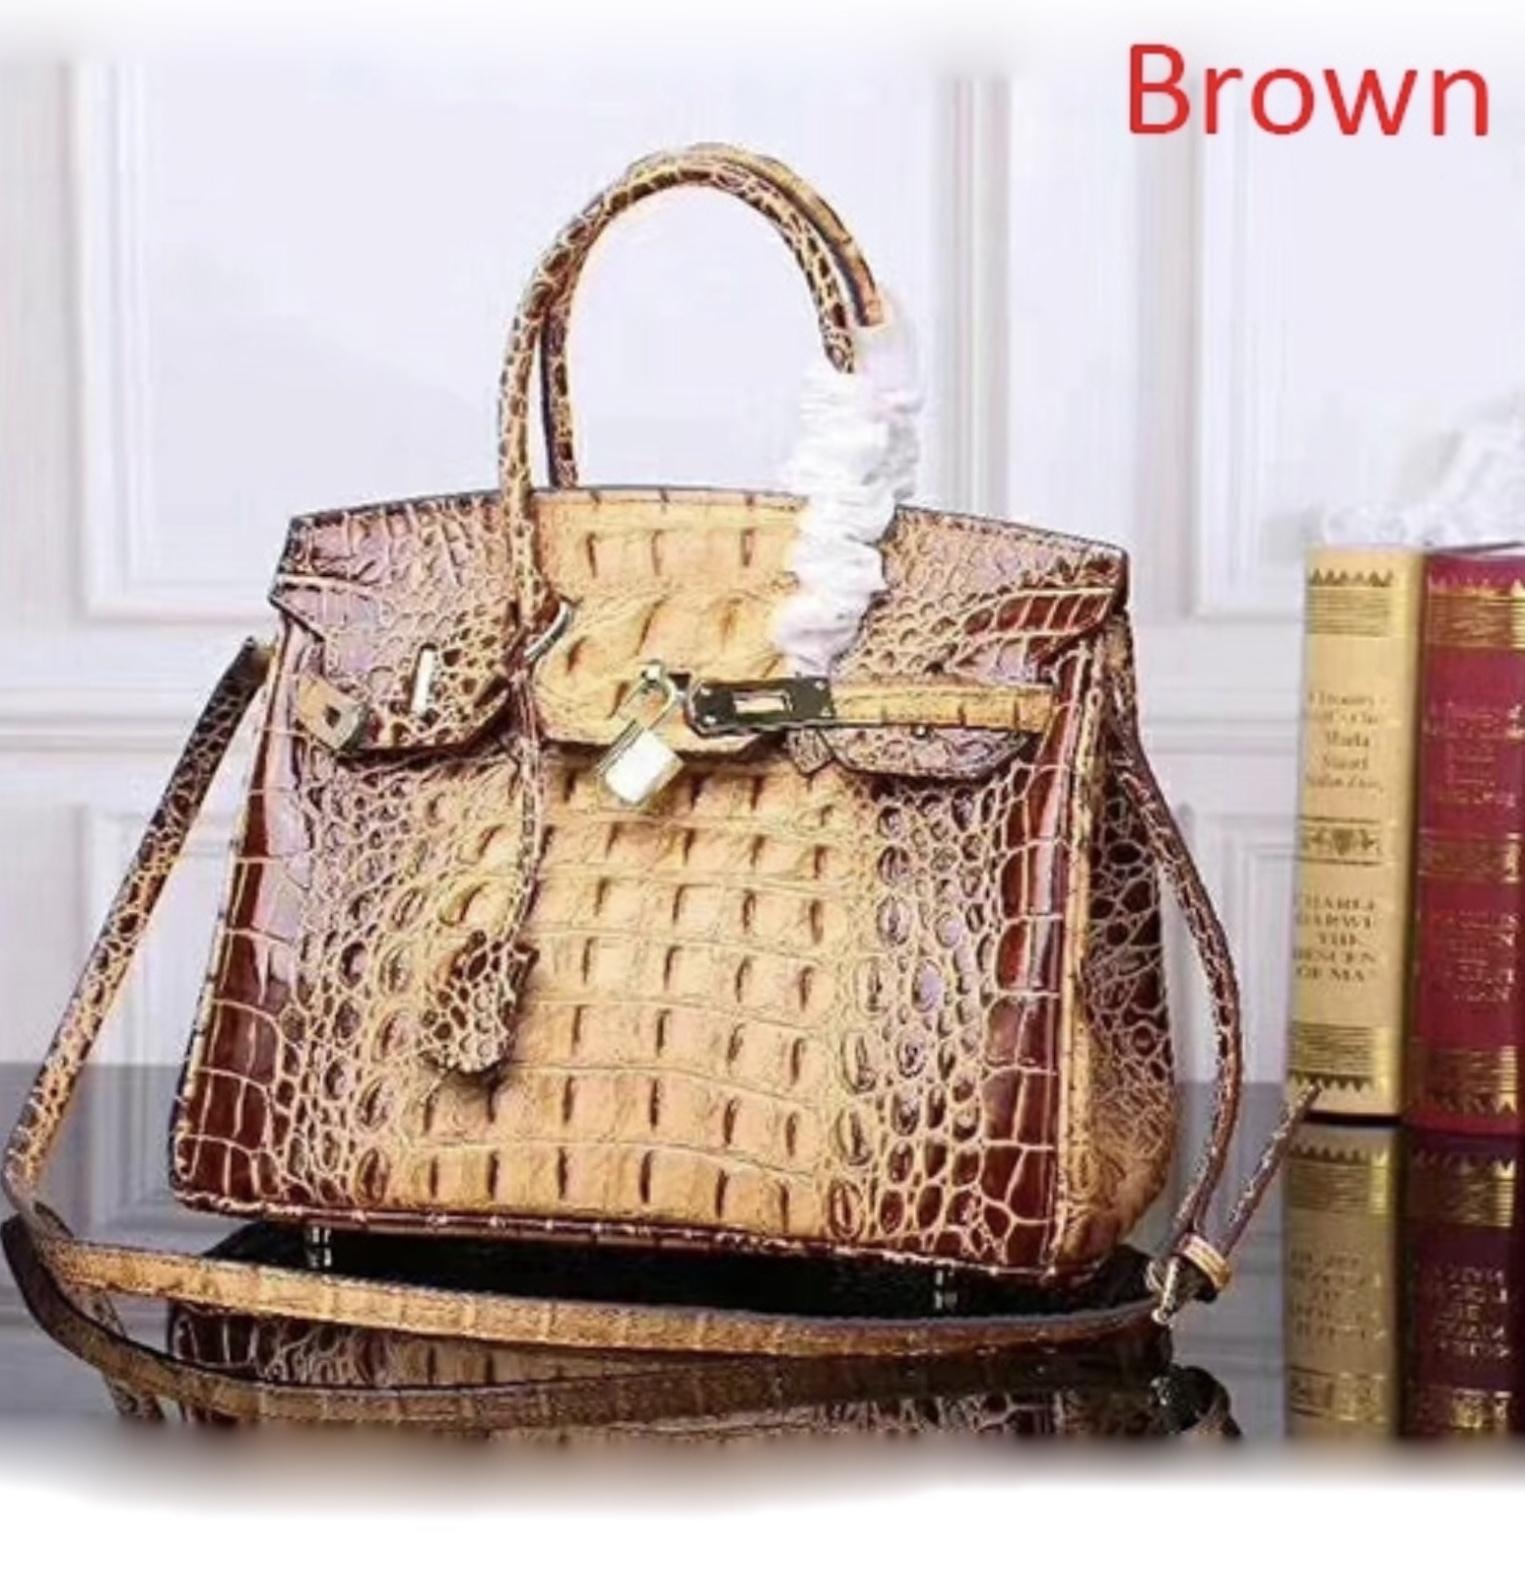 35 cm Crocodile Embossed Italian Leather Birkin Style Handbag Satchel Bag 1633L